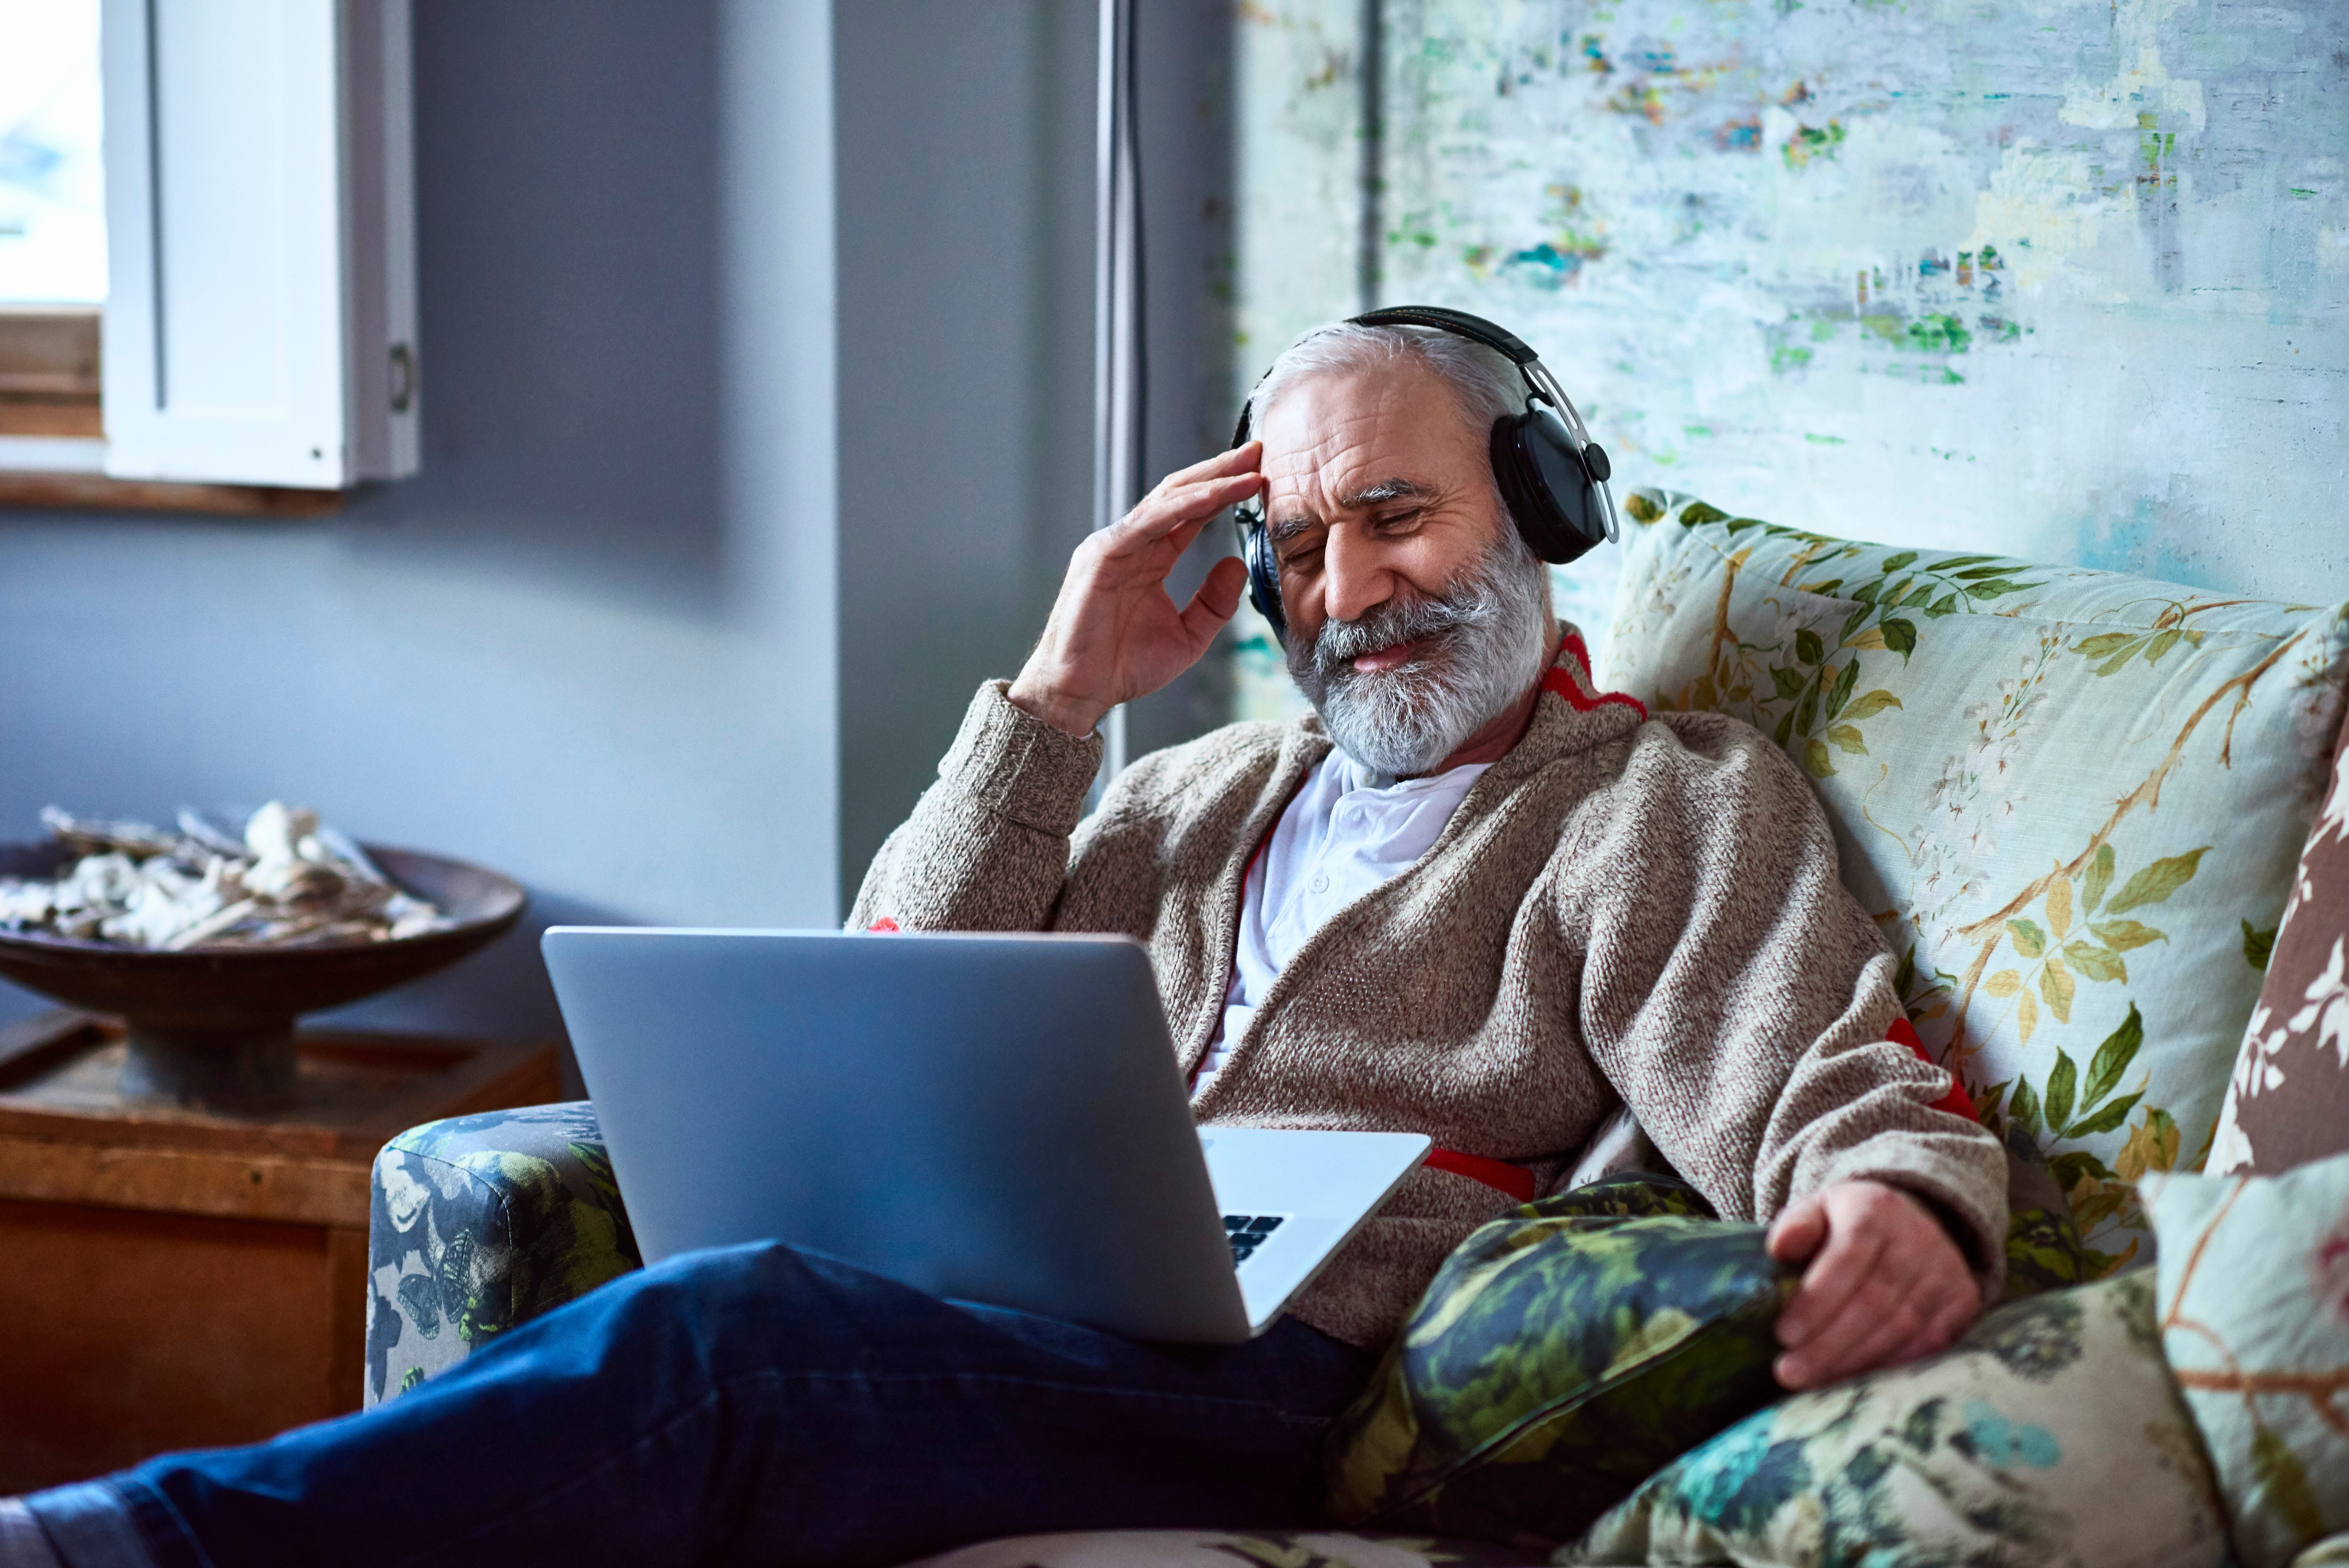 Portrait of mature man streaming movie on laptop wearing headphones